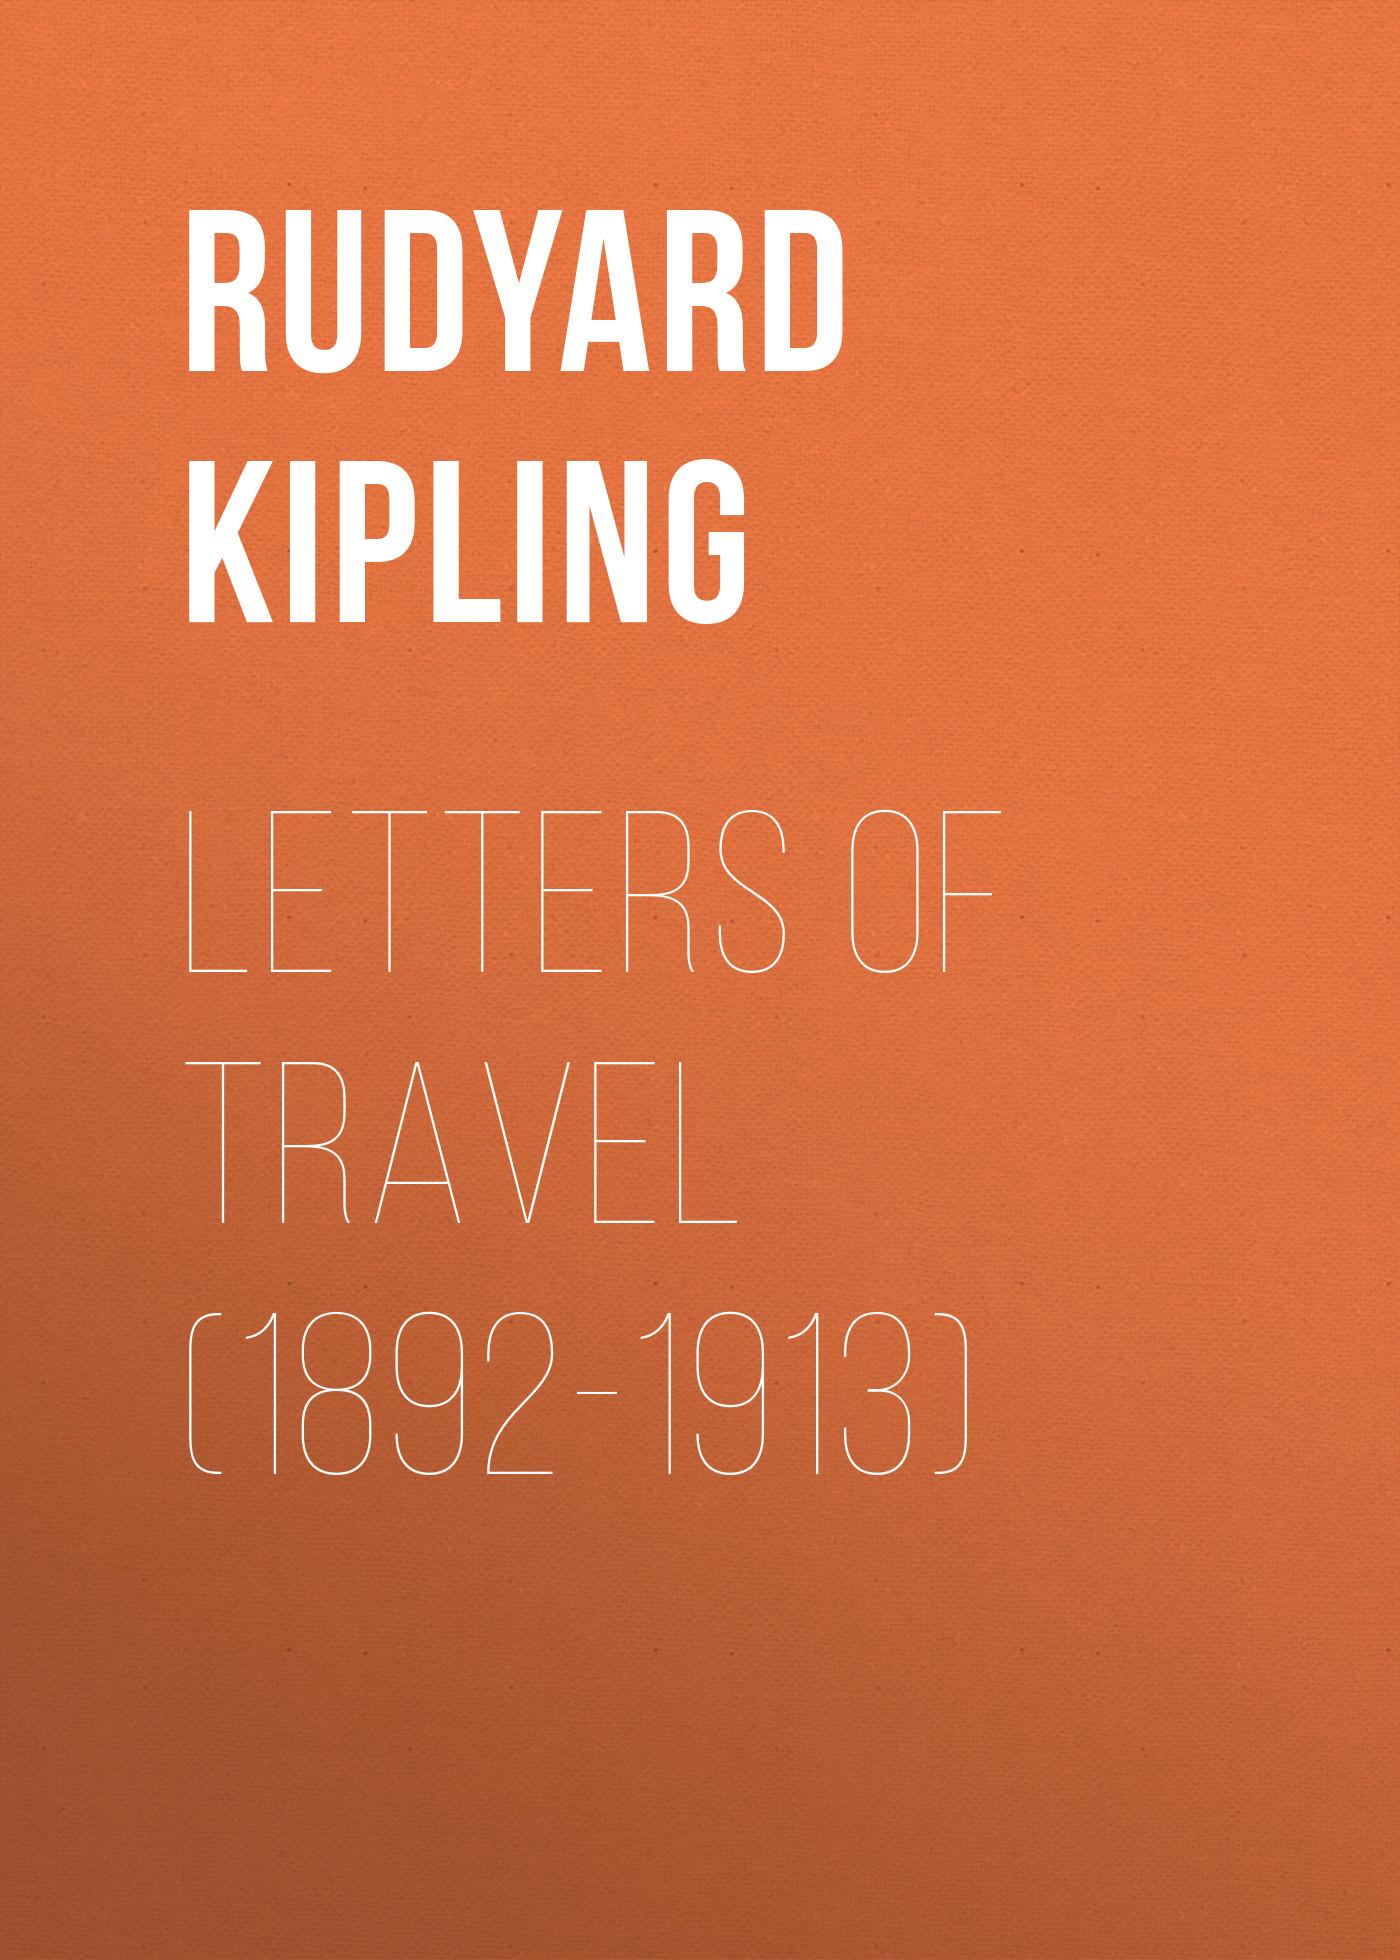 Редьярд Киплинг Letters of Travel (1892-1913) редьярд киплинг a diversity of creatures